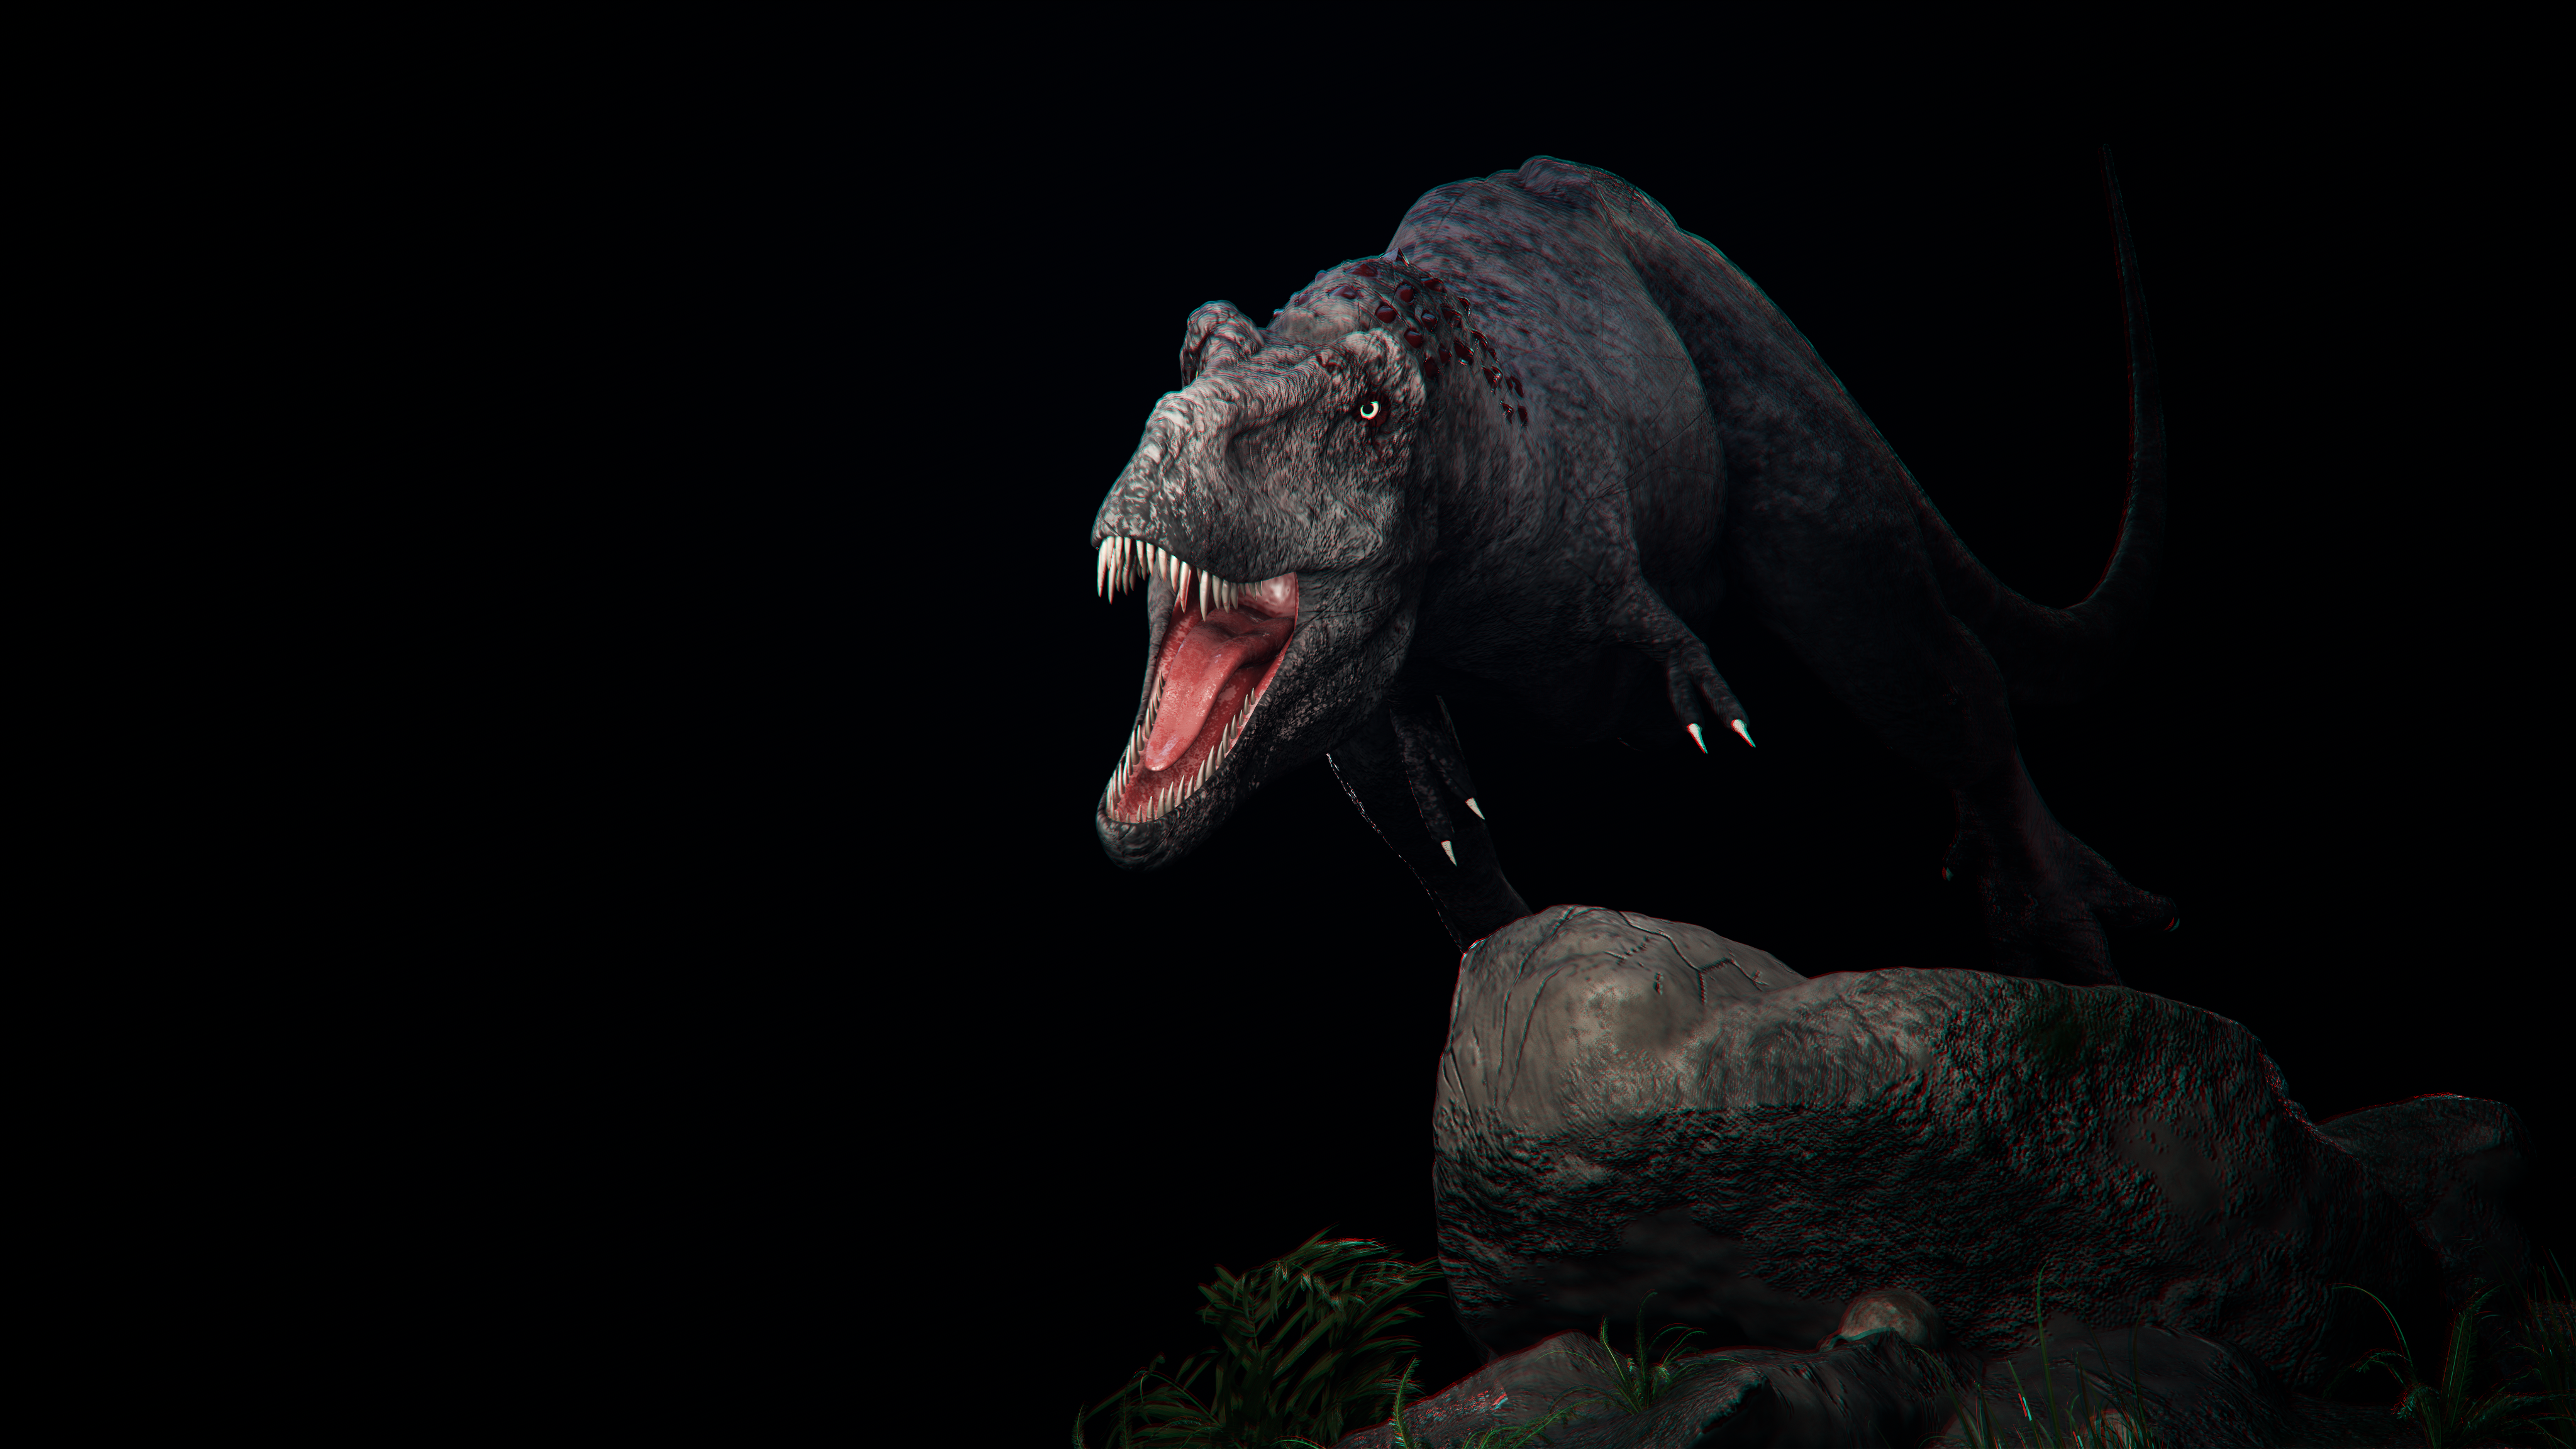 Tarbosaurus_image1_4_00000.png